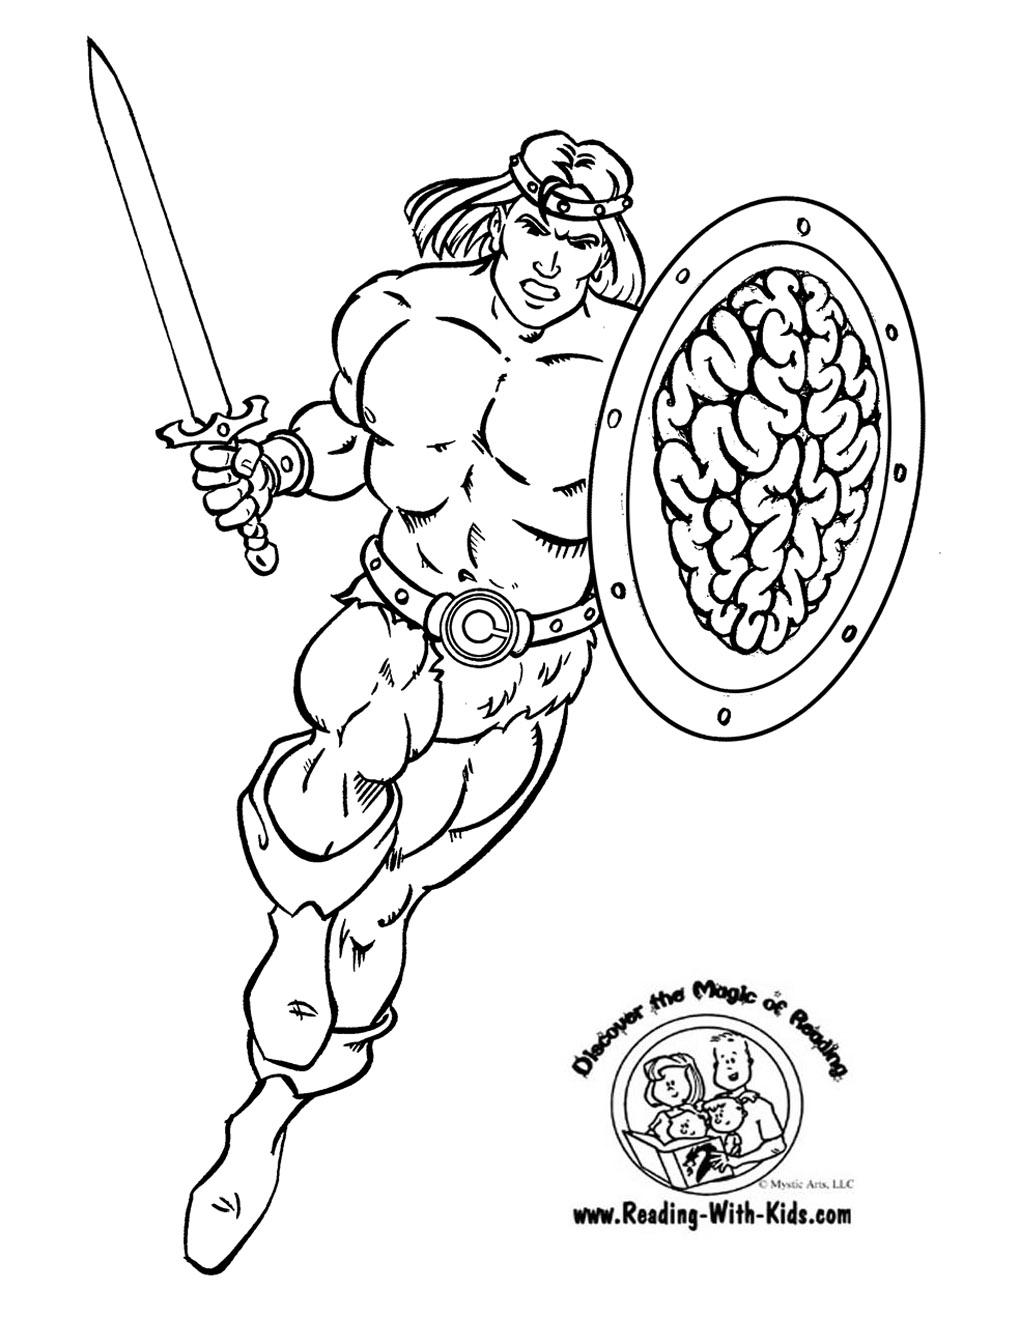 Conan The Barbarian coloring #6, Download drawings